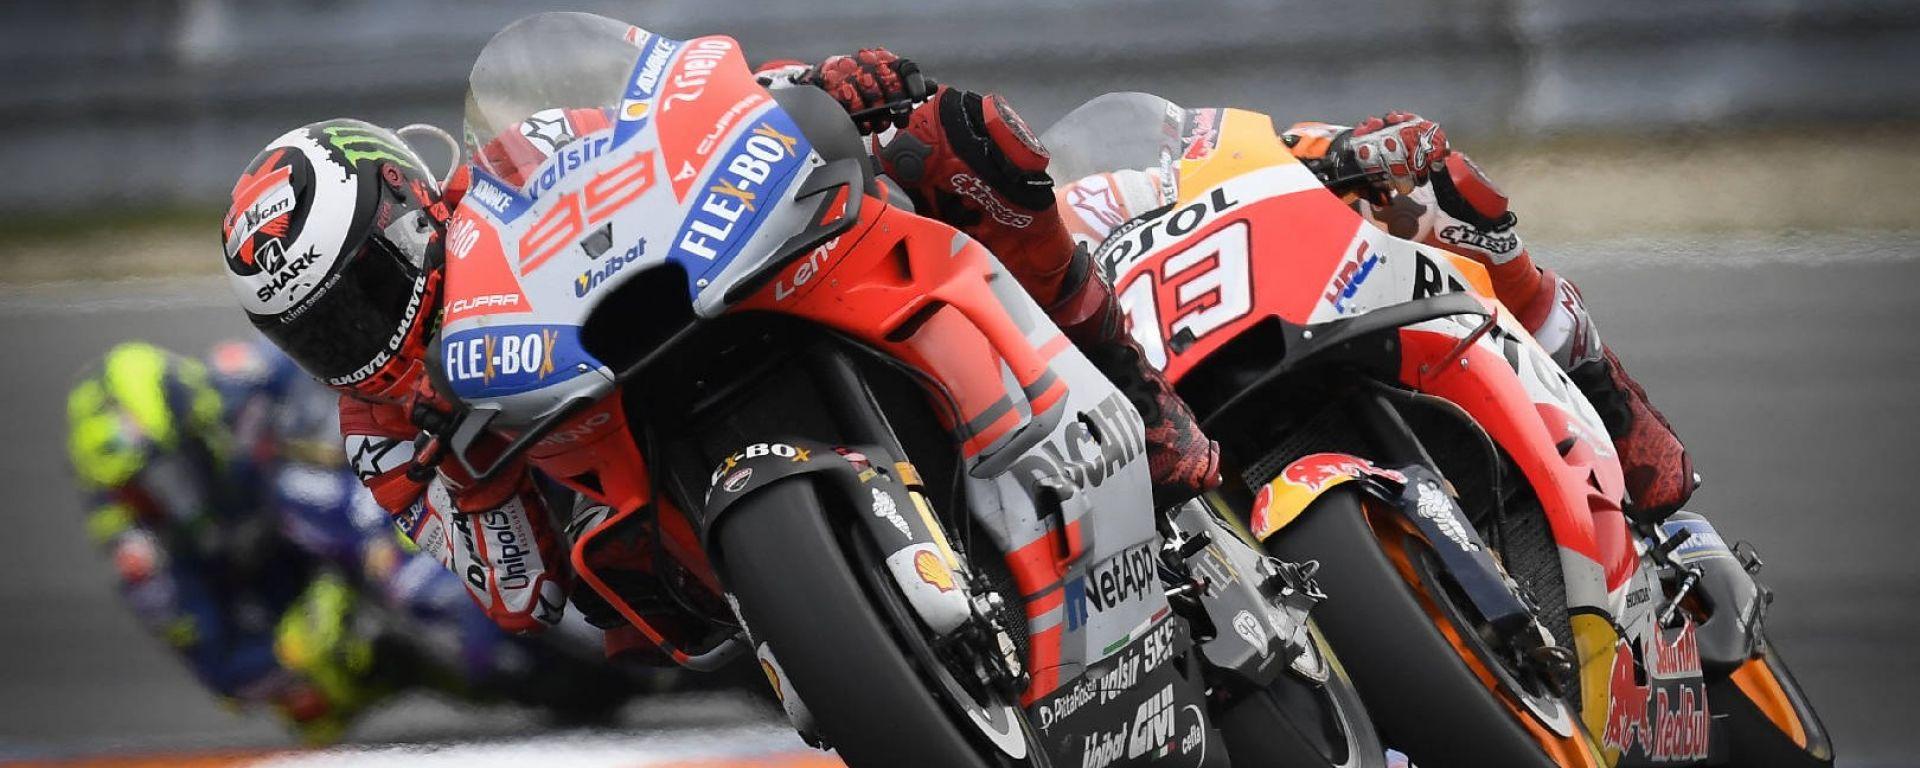 MotoGP Red Bull Ring 2018, gli orari TV del GP d'Austria